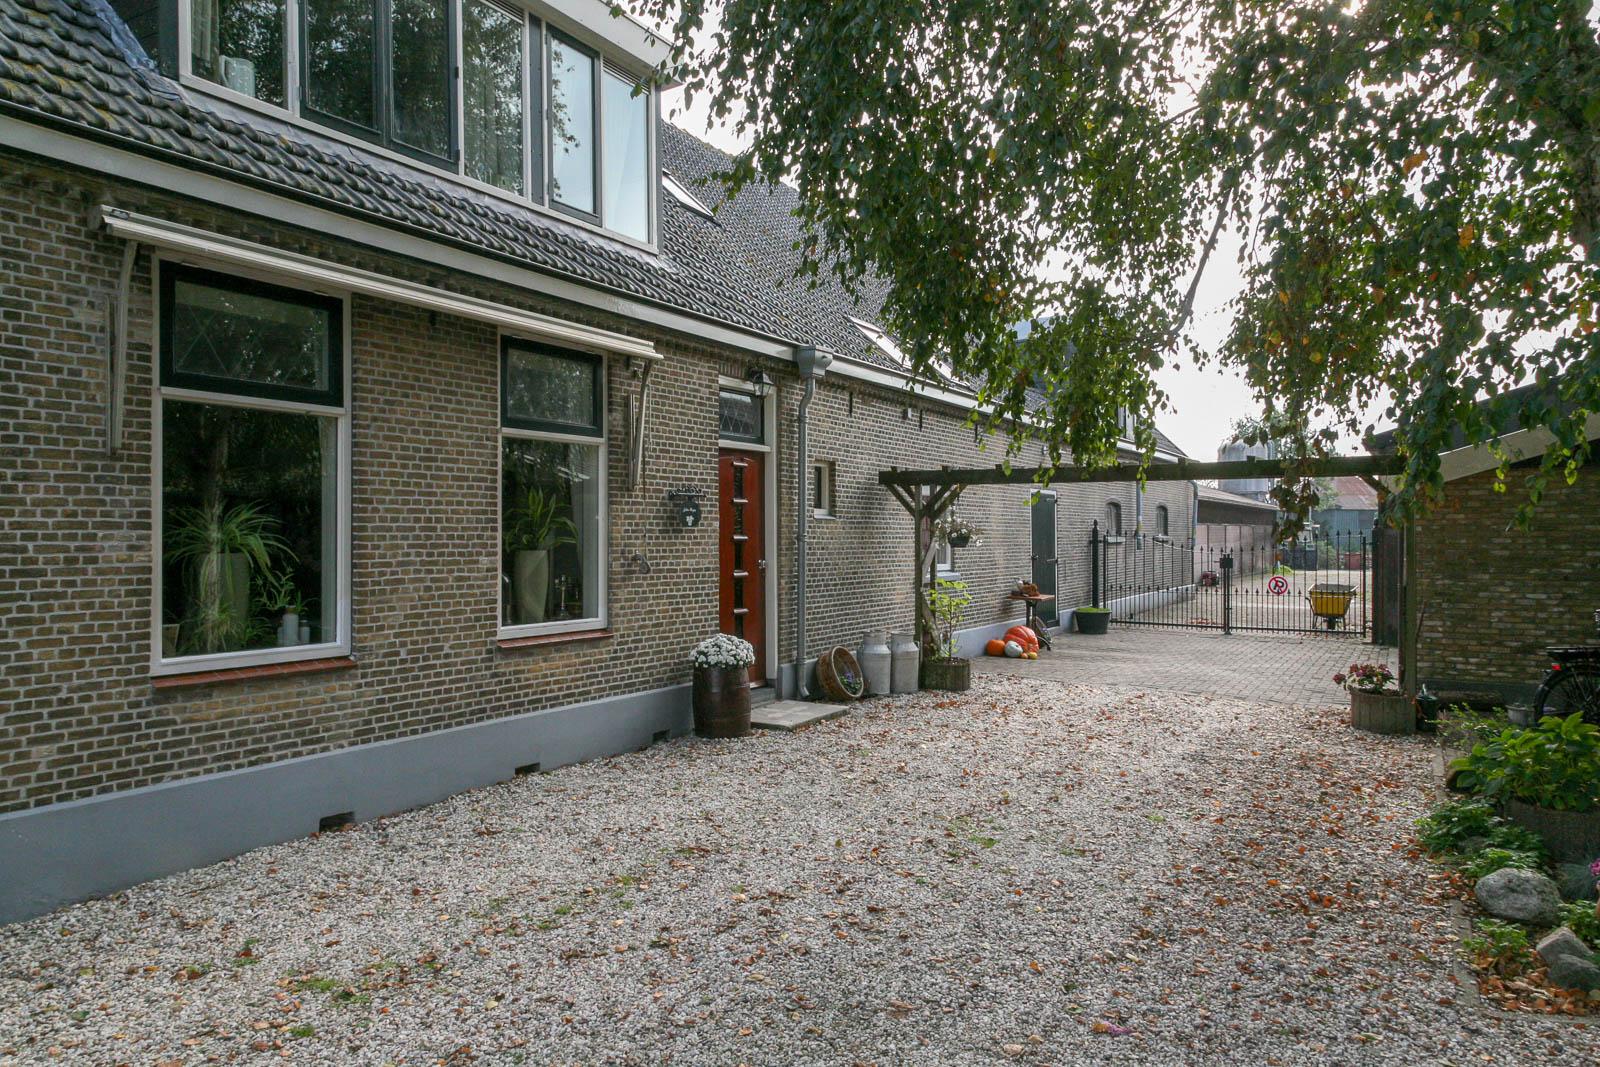 Hillegondahoeve-De Oude Stal-1478